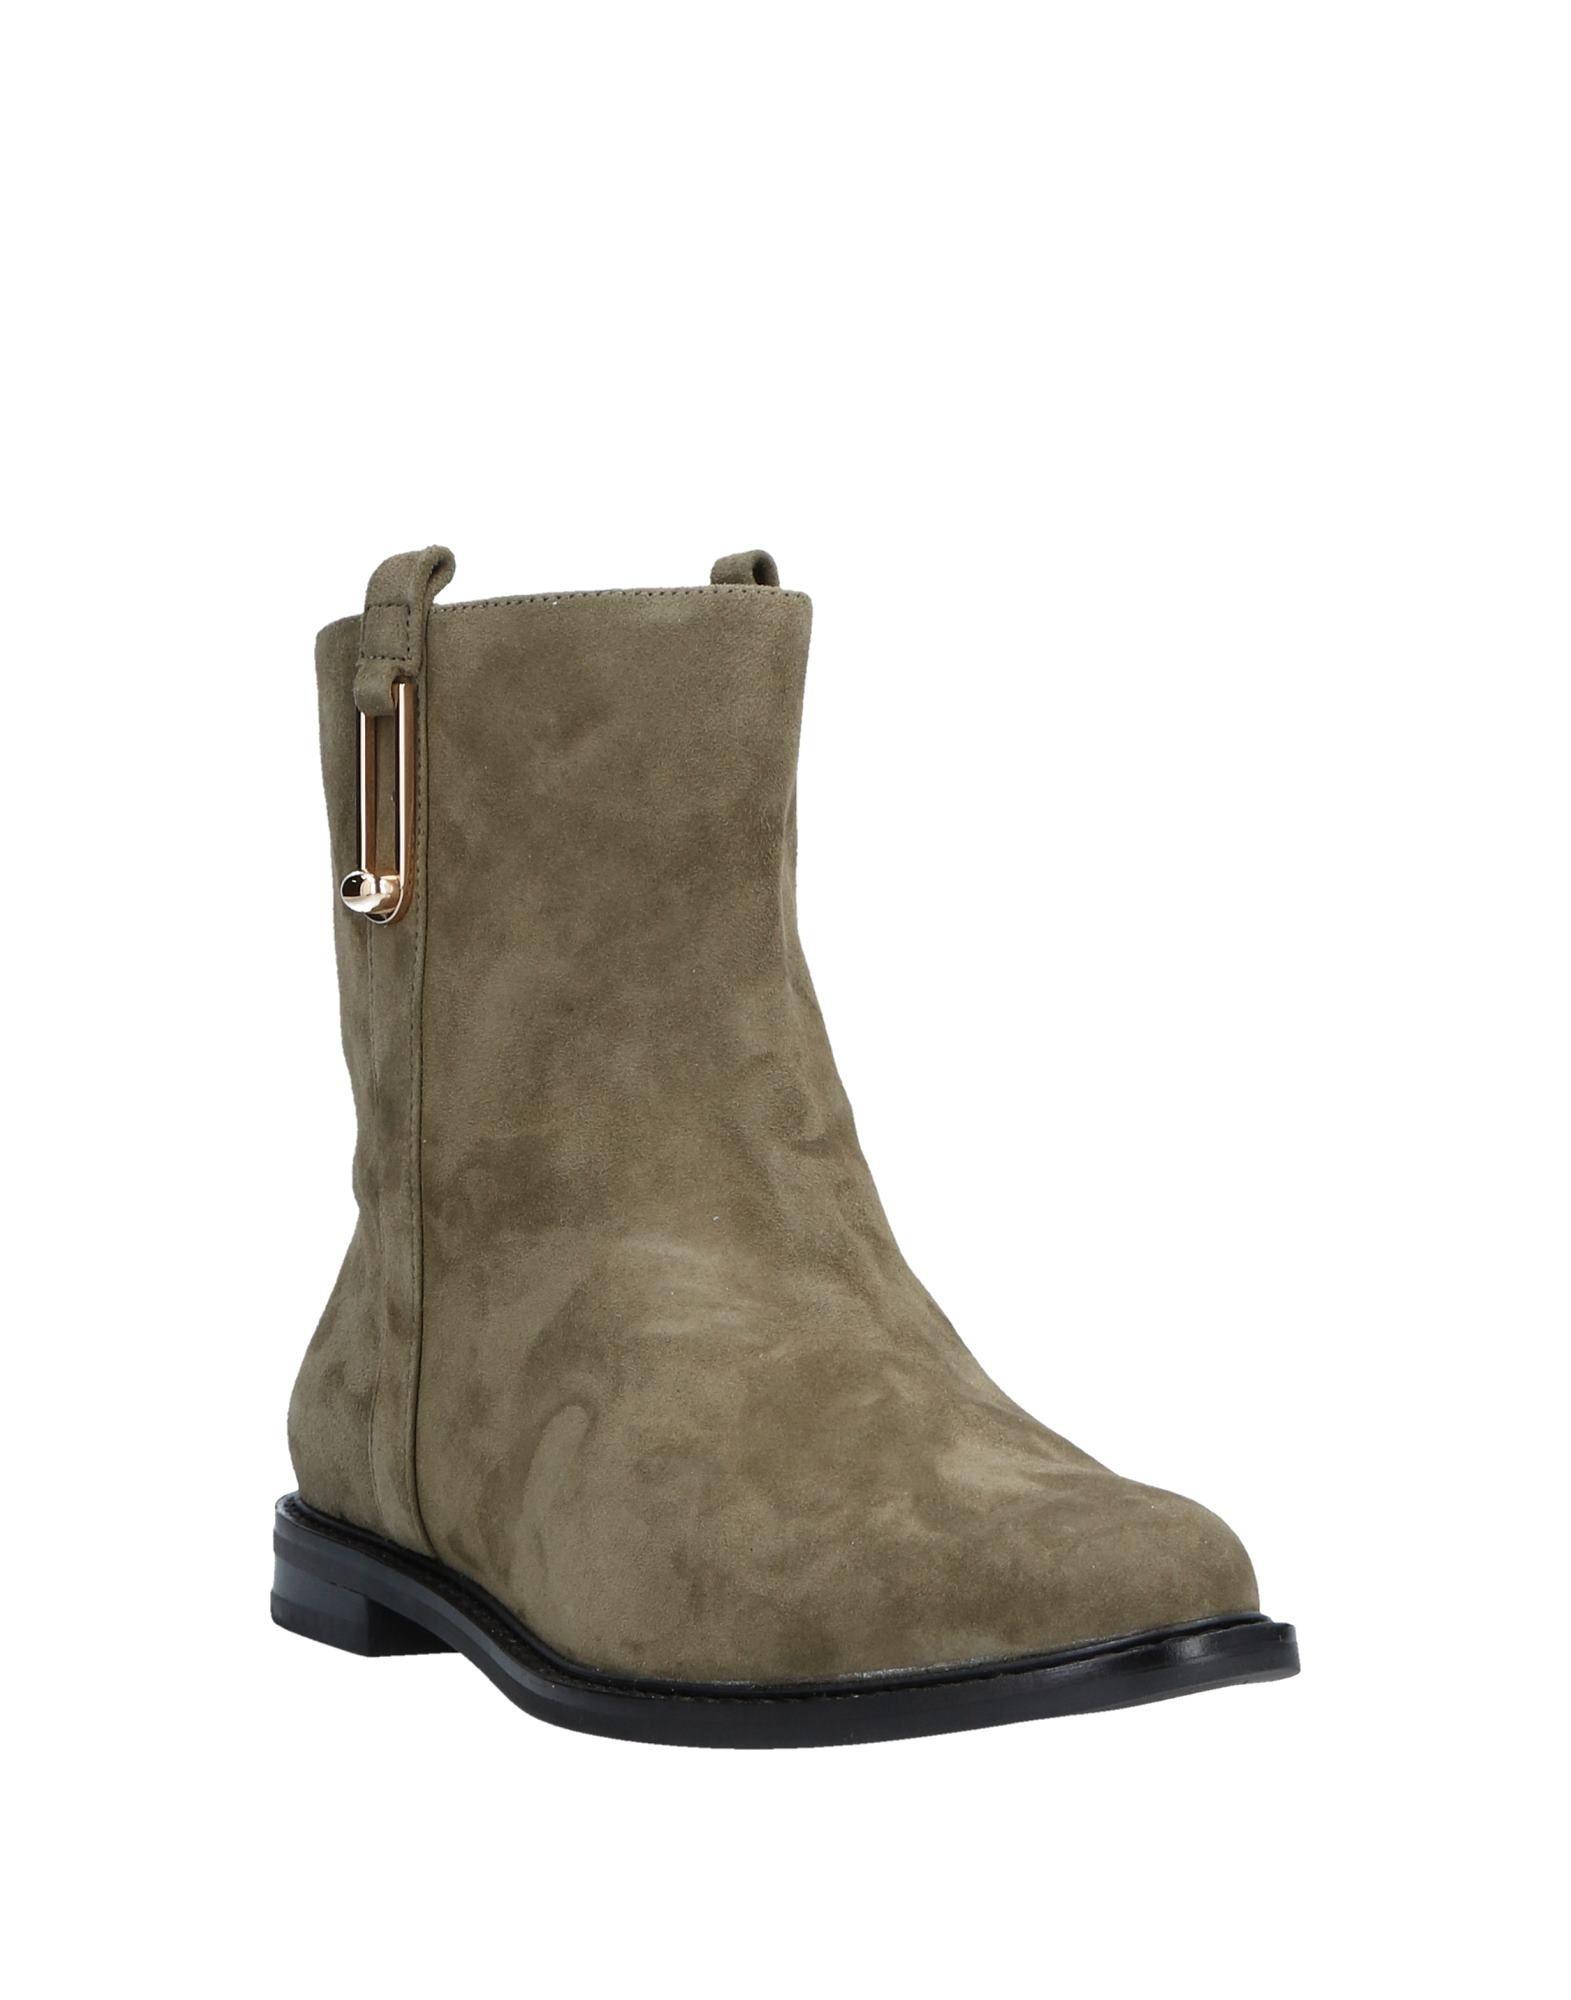 Rabatt Schuhe  Stella Luna Stiefelette Damen  Schuhe 11542700OE 6eac75